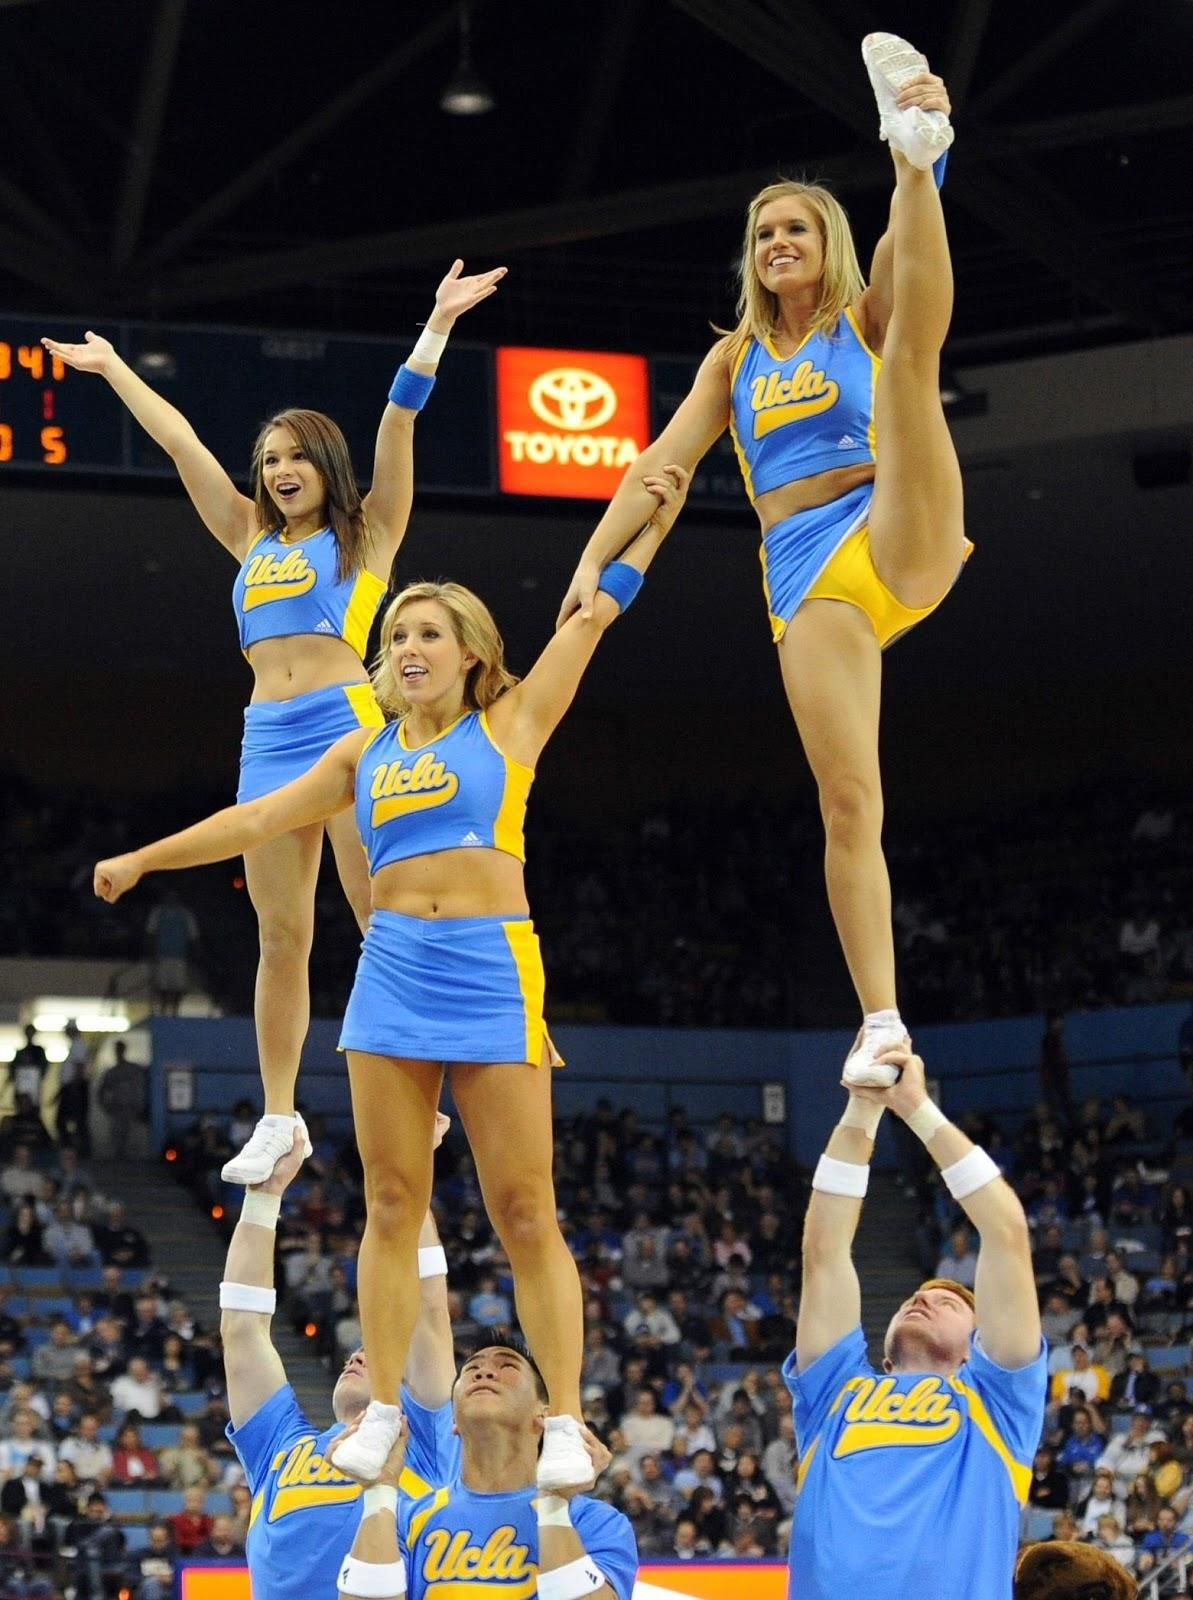 UCLA Cheerleaders Are Flexible